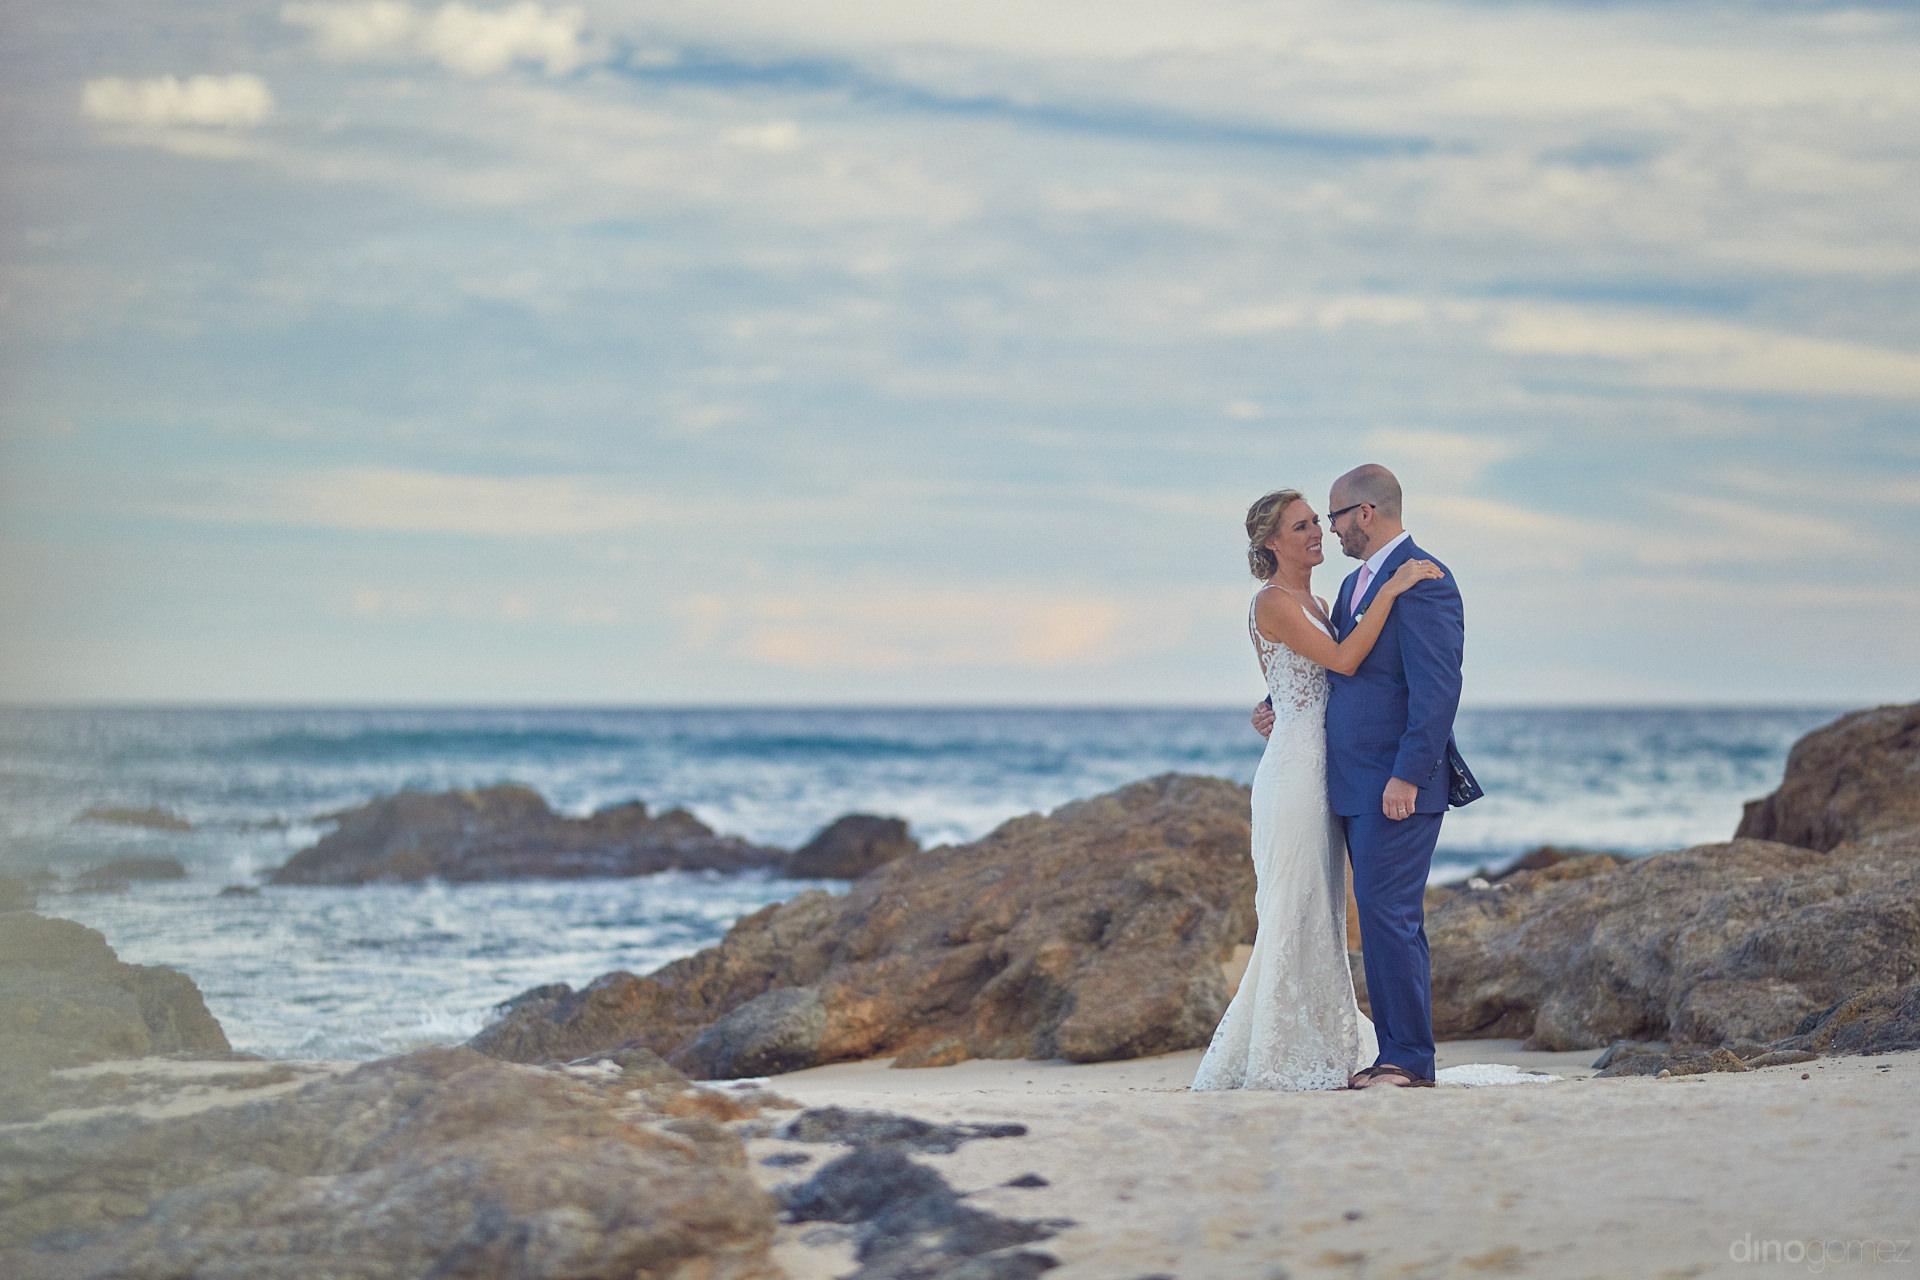 Destination Wedding Photographer In Cabo San Lucas Was Awarded Internation Prize